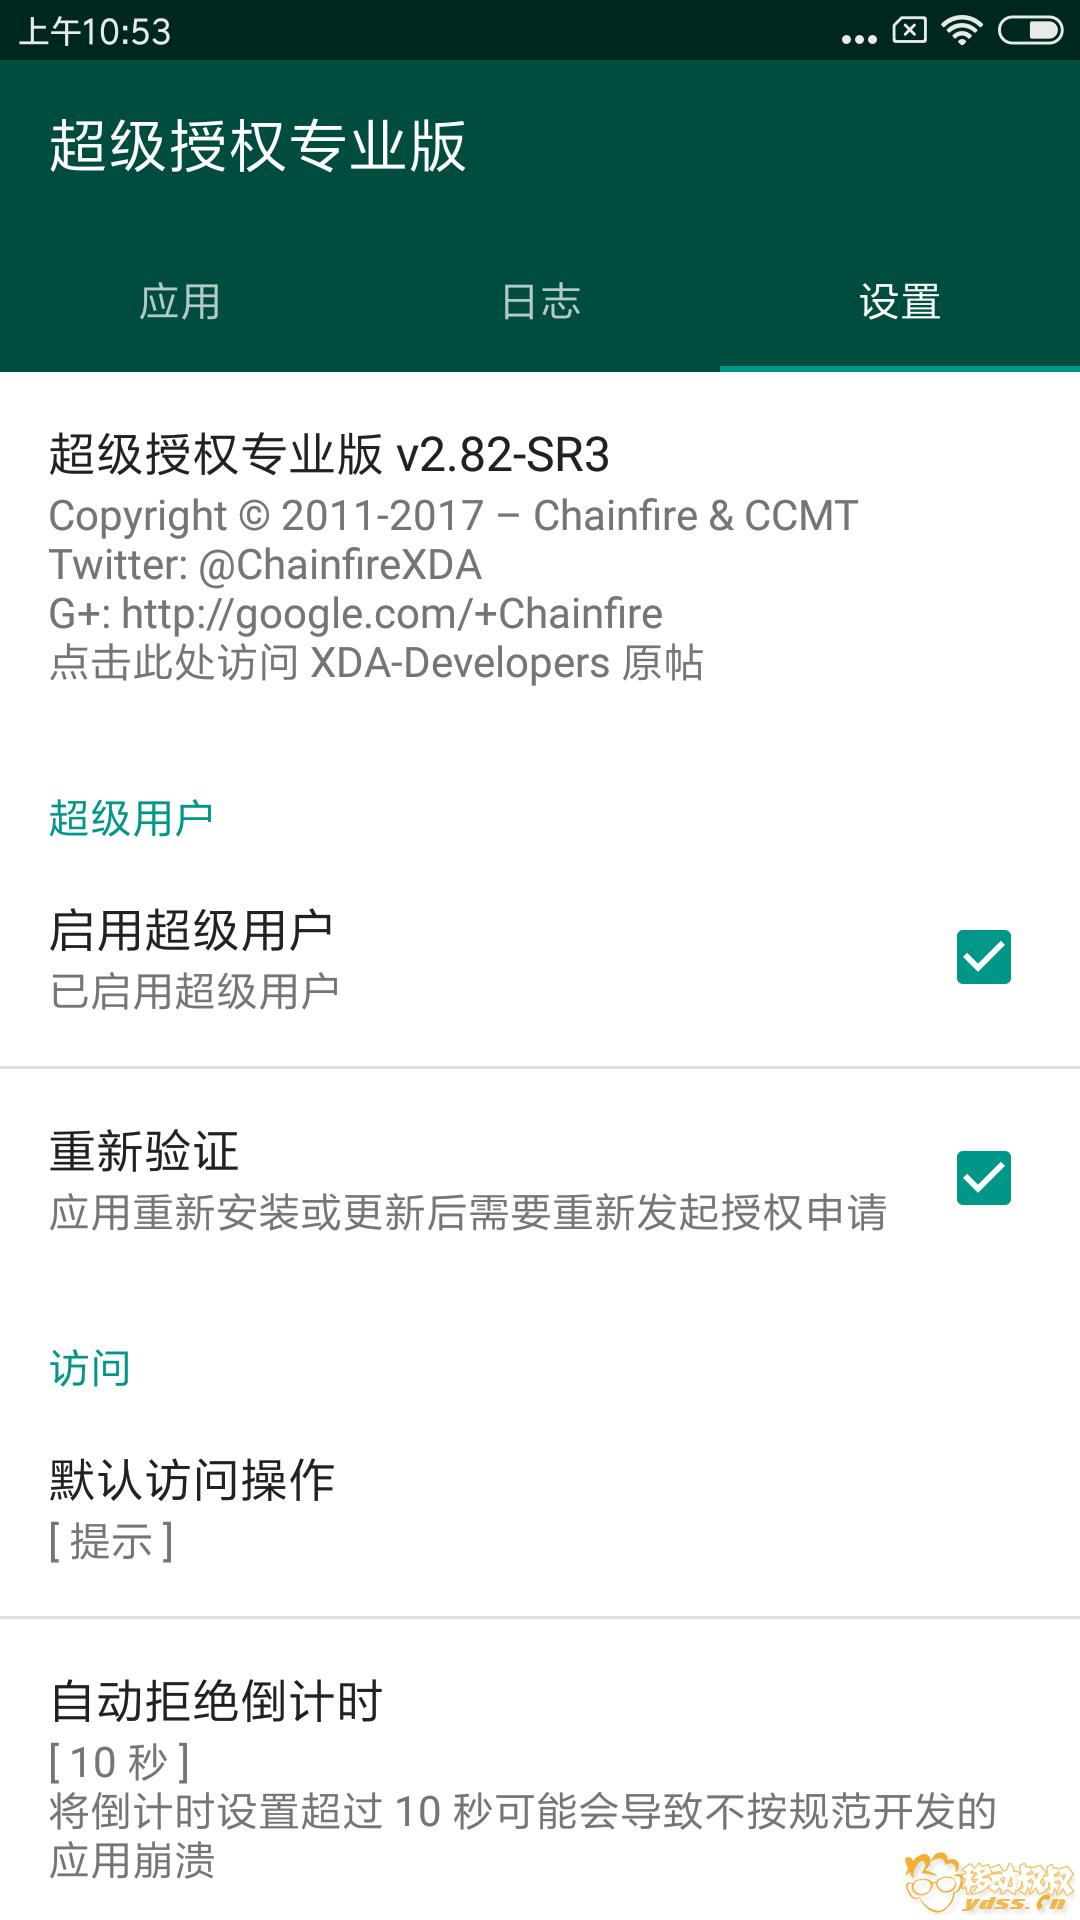 Screenshot_2018-08-08-10-53-22-753_eu.chainfire.supersu.png